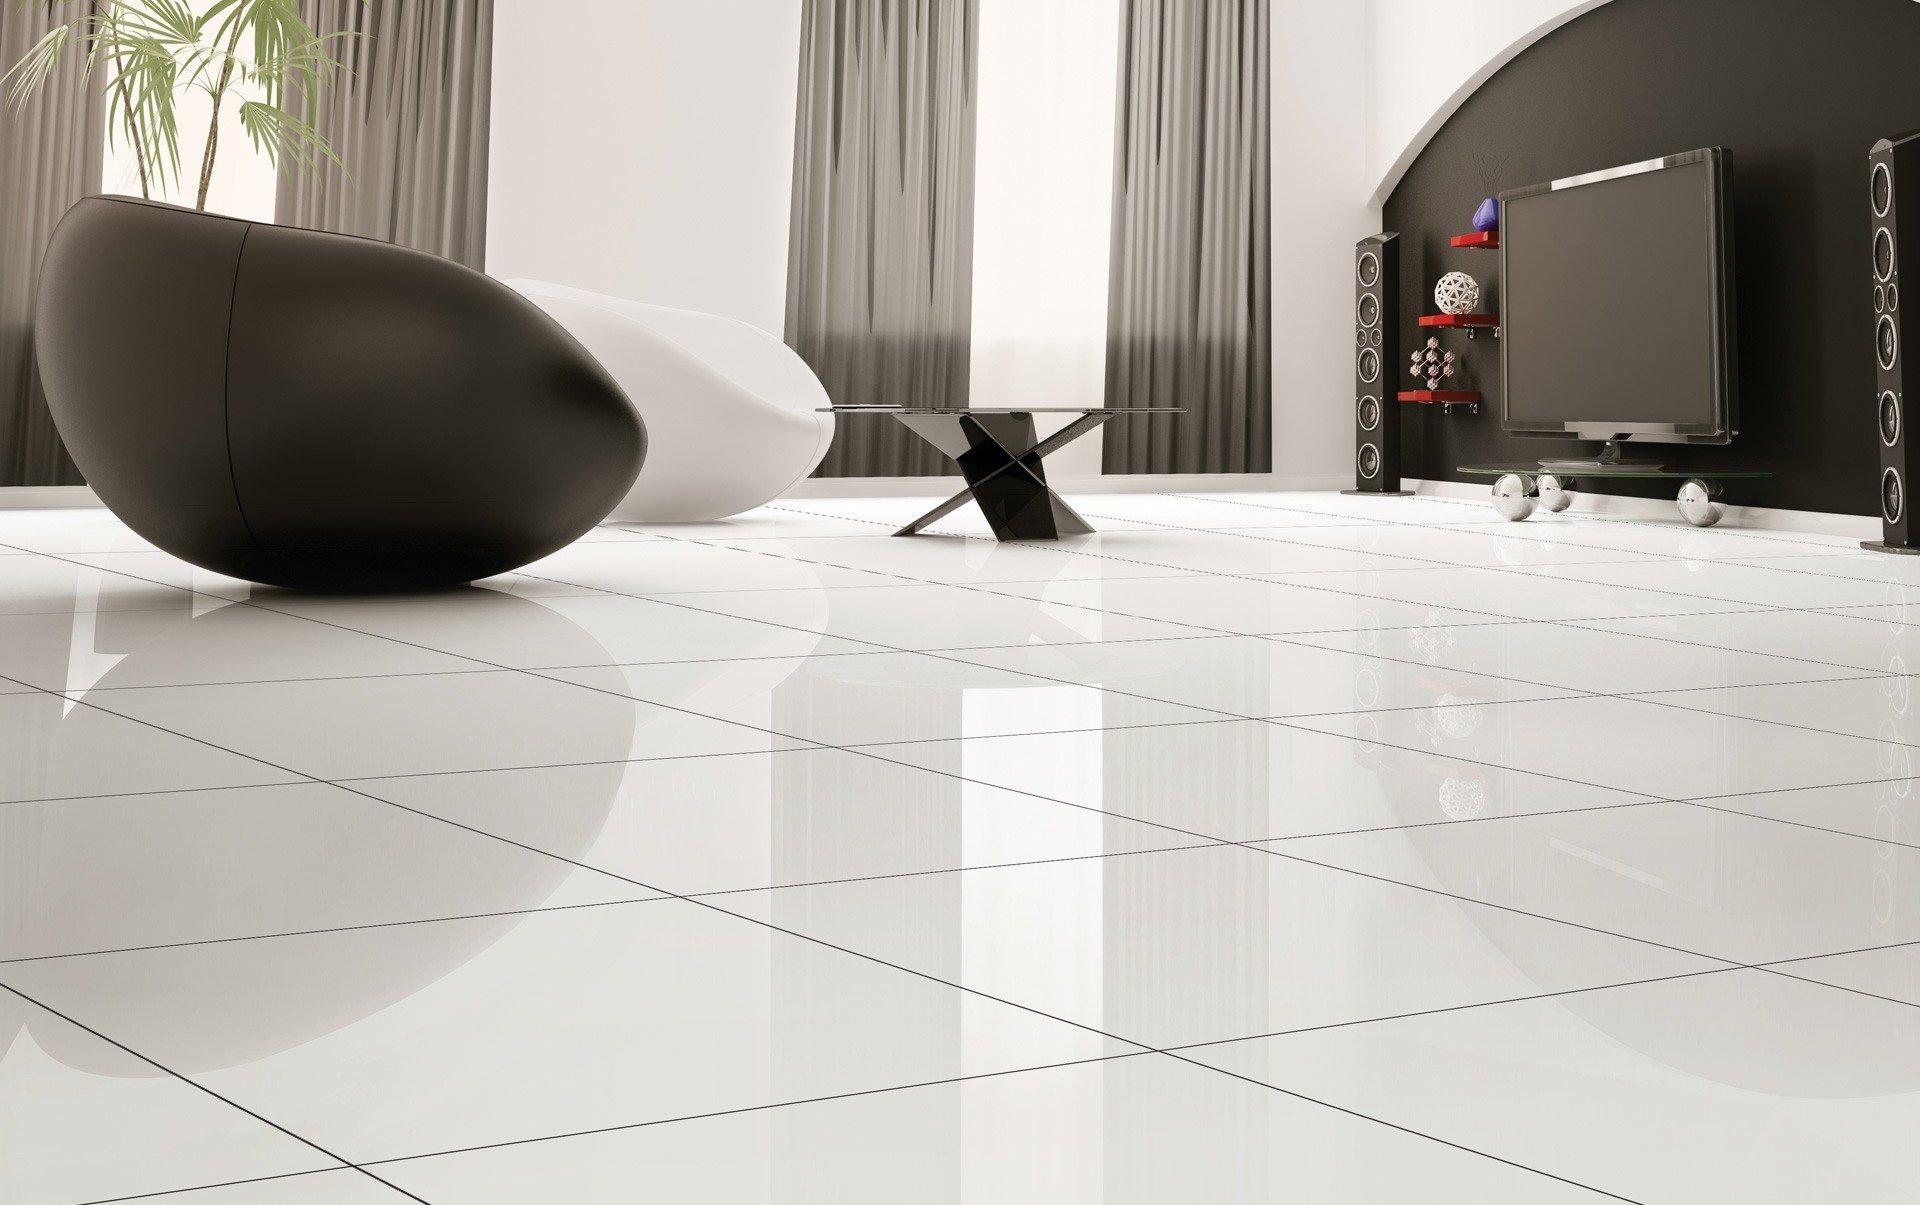 Unique kitchen tiles brisbane taste brisbane tile grout cleaning sealing best price dailygadgetfo Gallery